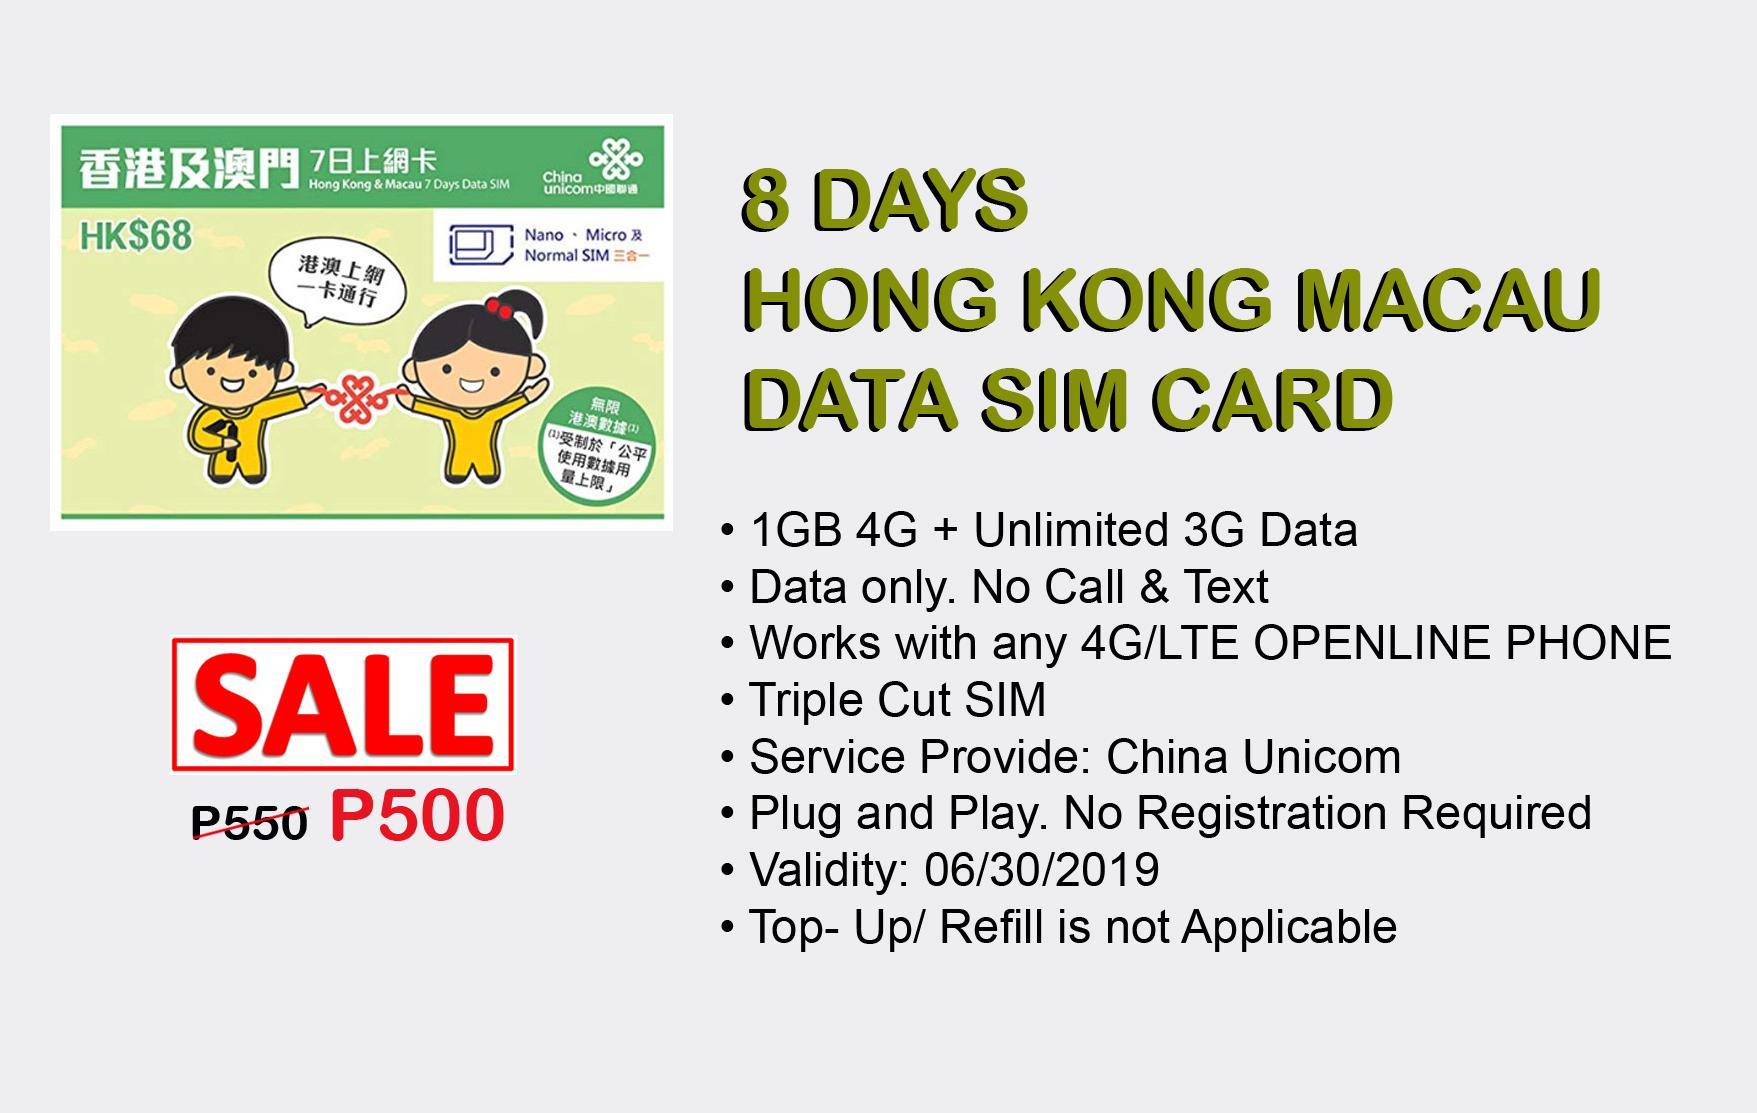 Aktifator Simcard Sim Card Kartu Perdana Activator Hk Eropa Uk 30d 12gb Source Aktivator 8 Days